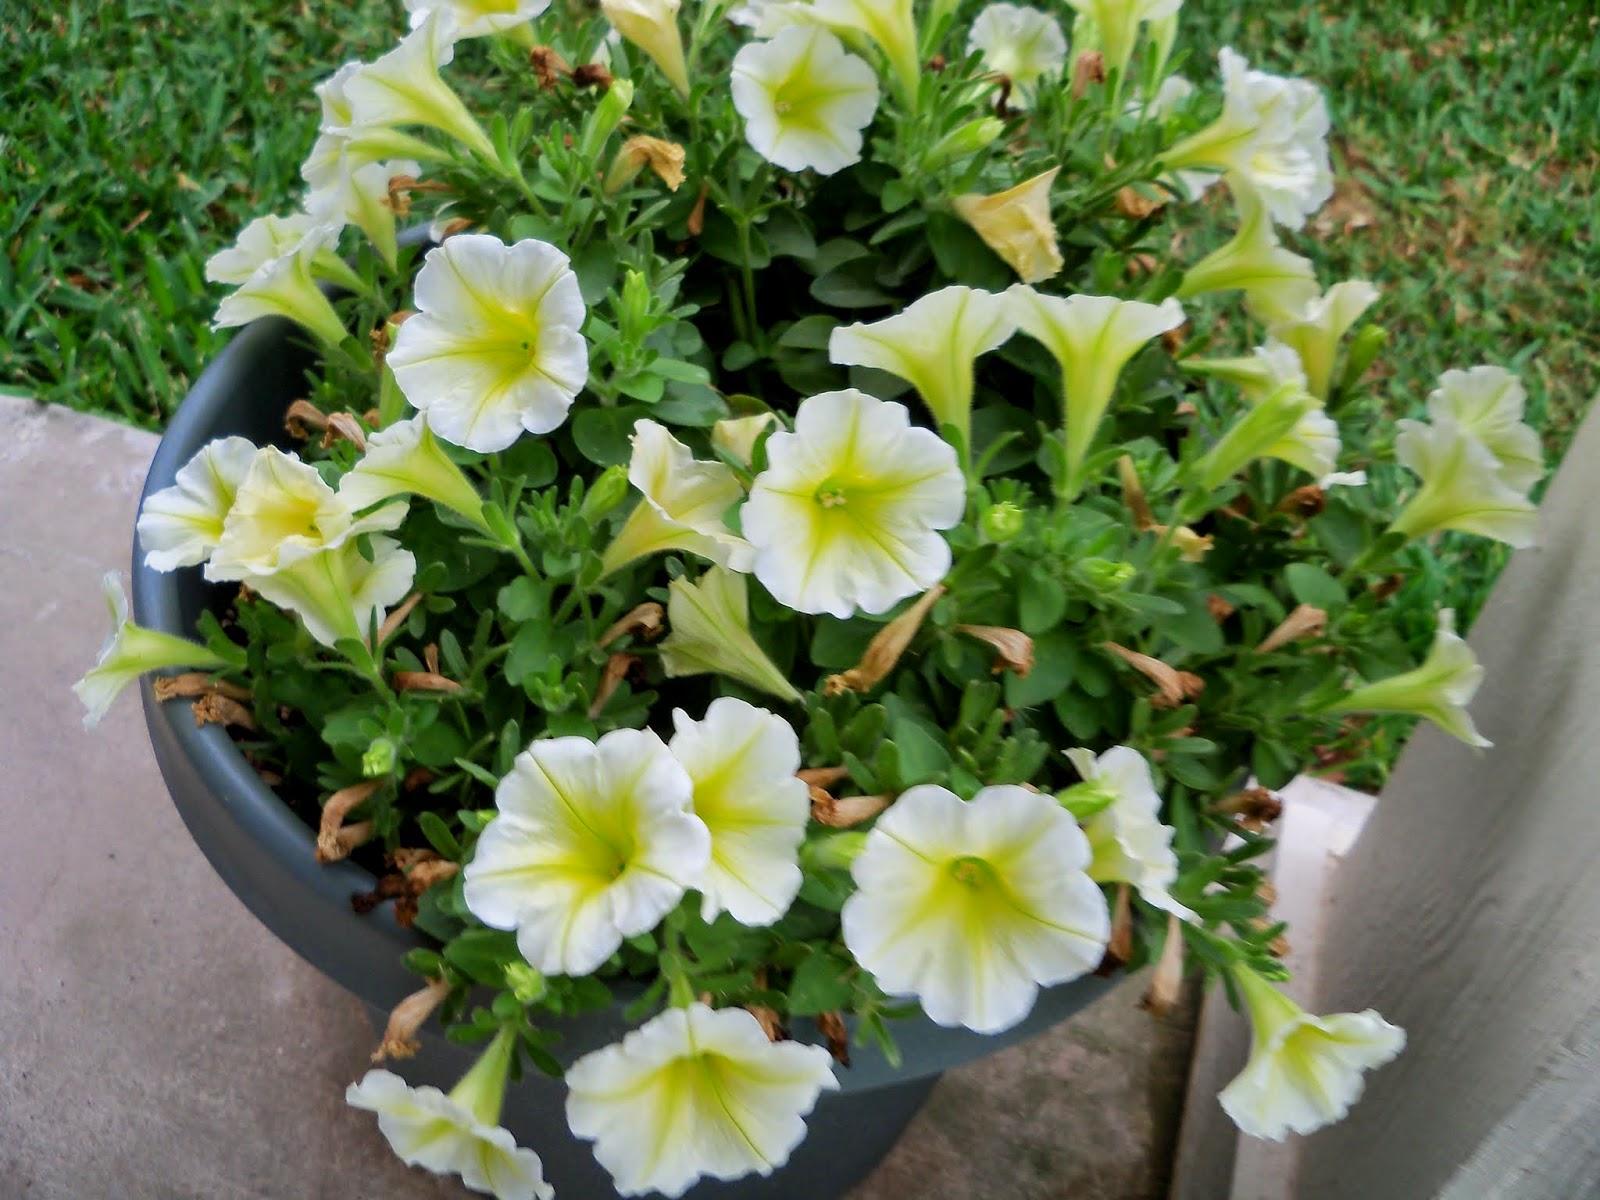 Gardening 2014 - 116_1859.JPG